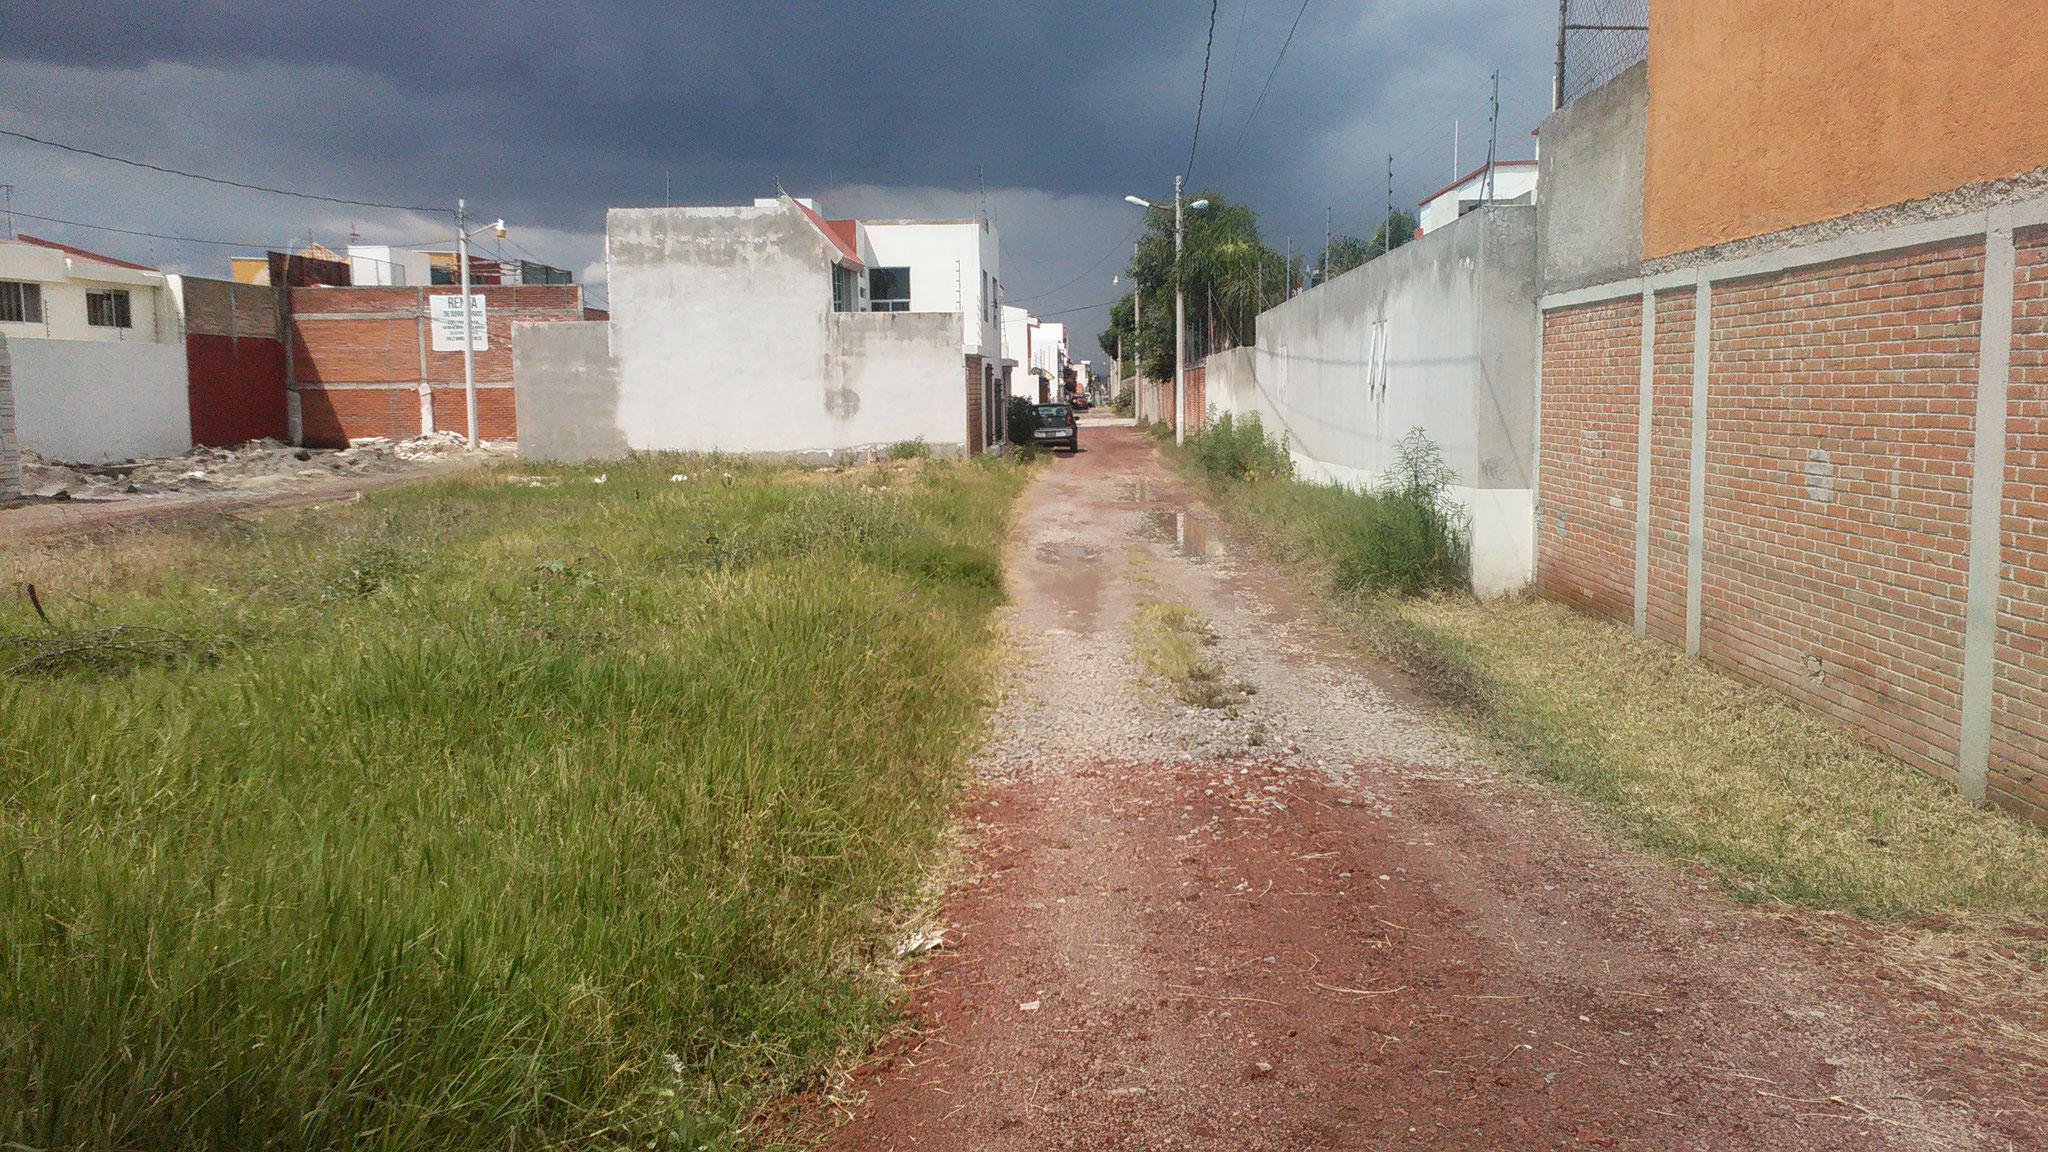 Terreno residencial en Morillotla San Andrés Cholula ideal para desarrollar dos a tres casas en régimen de condominio. Para ver en galería pulsa en la cruz.